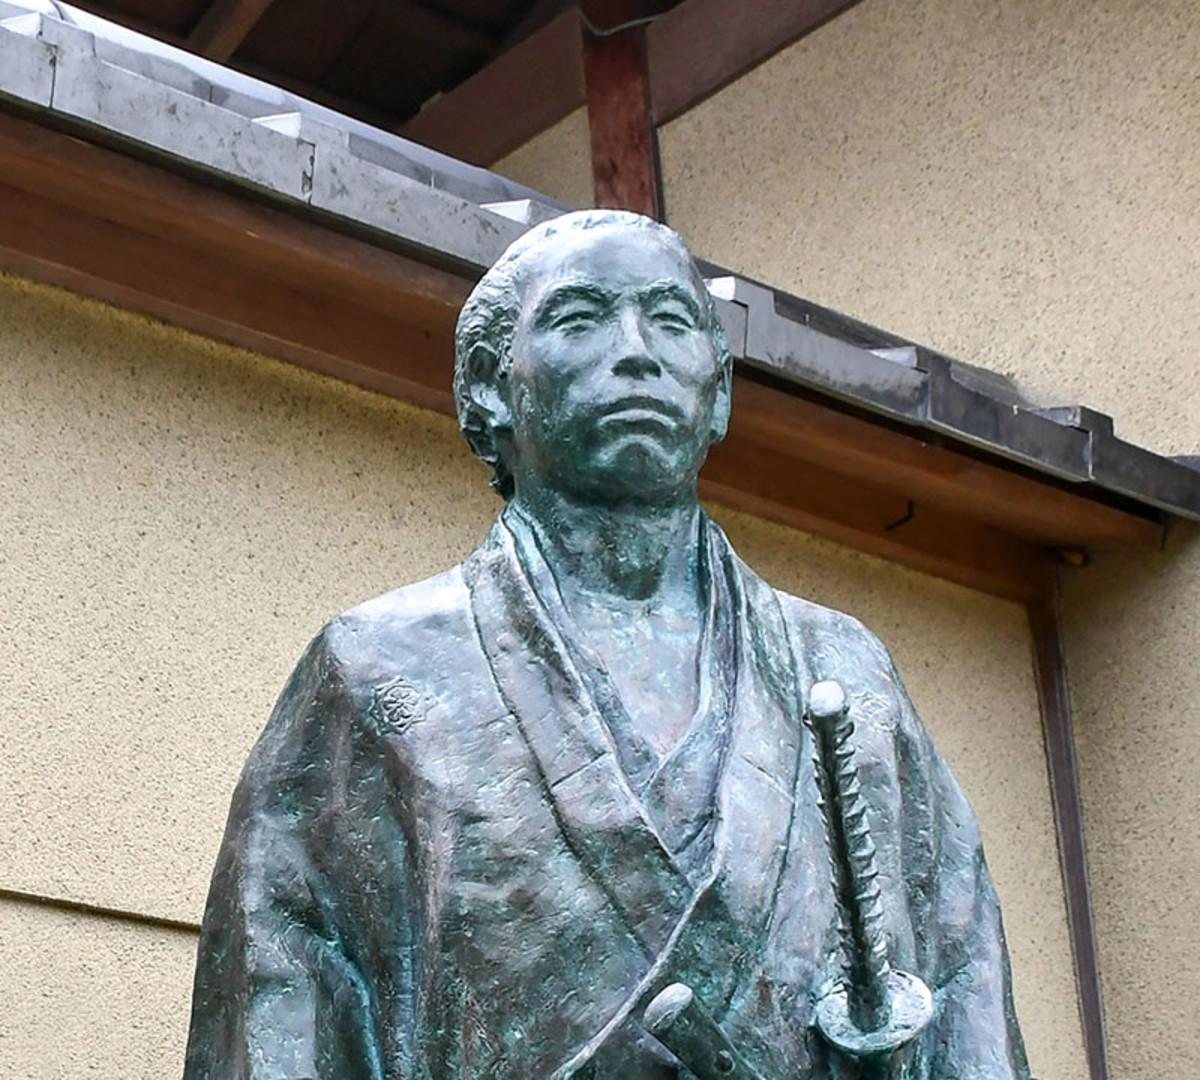 Statue of Sakamoto Ryōma at the outskirts of Kyoto City.